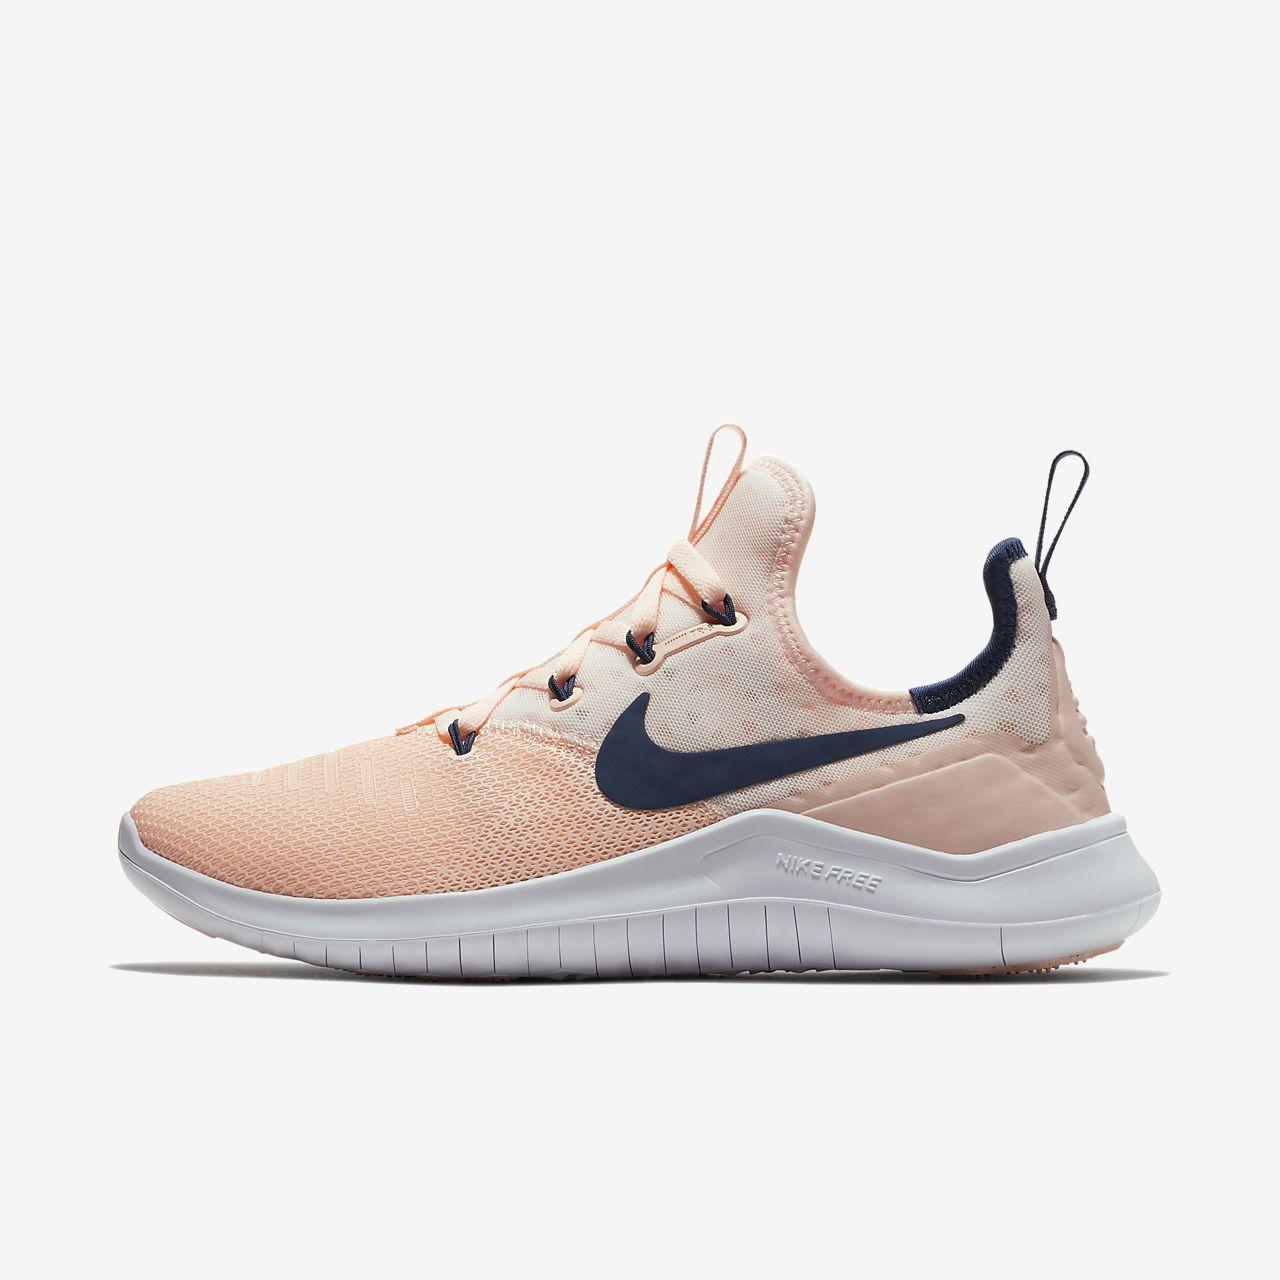 844e0a950ef02 ... official store nike free tr8 womens gym hiit cross training shoe 157e1  35694 ...